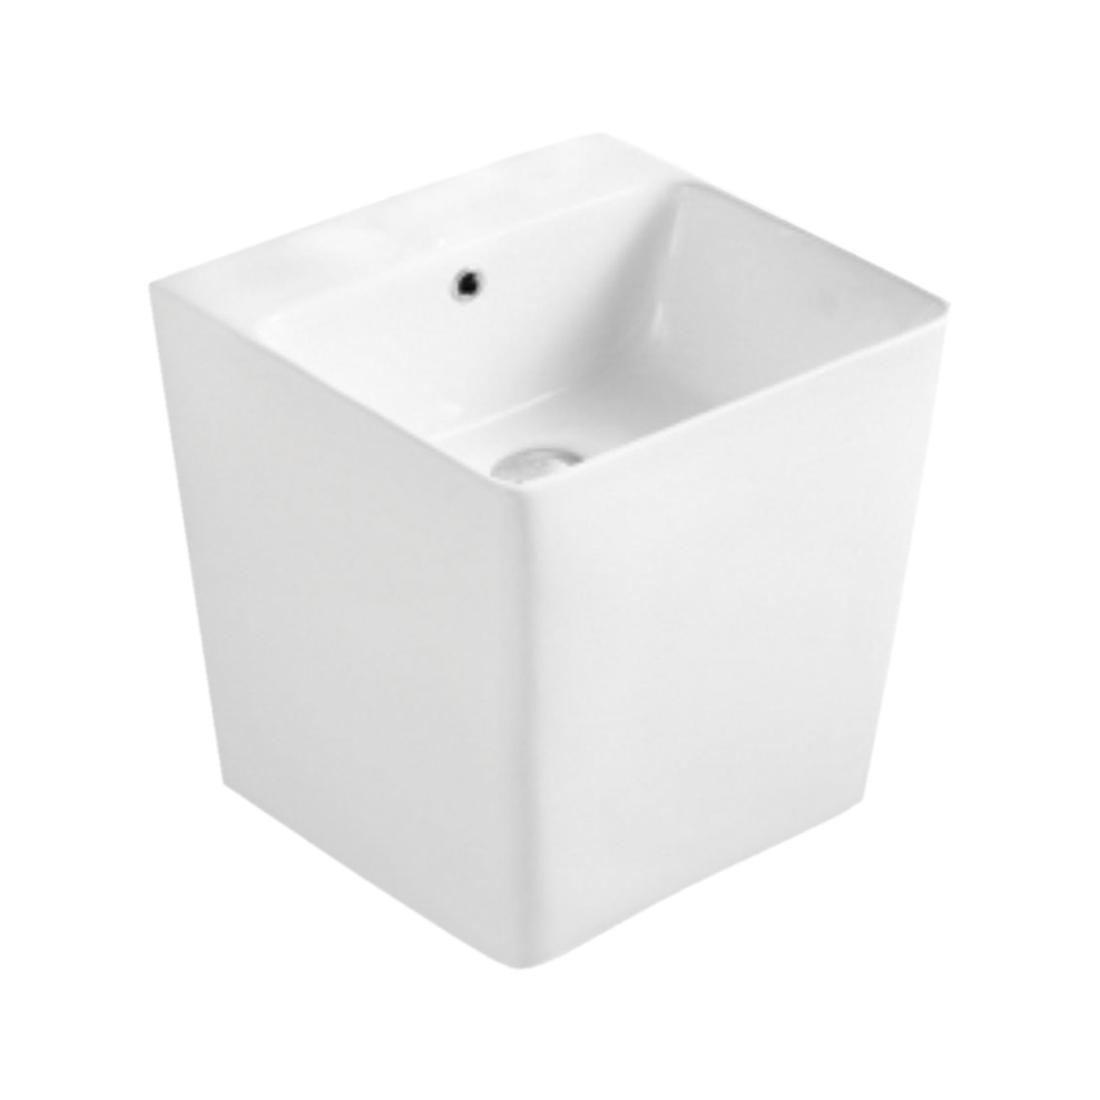 Kerovit Pitcher KB6400 Wash Basin With Integrated Half Pedestal